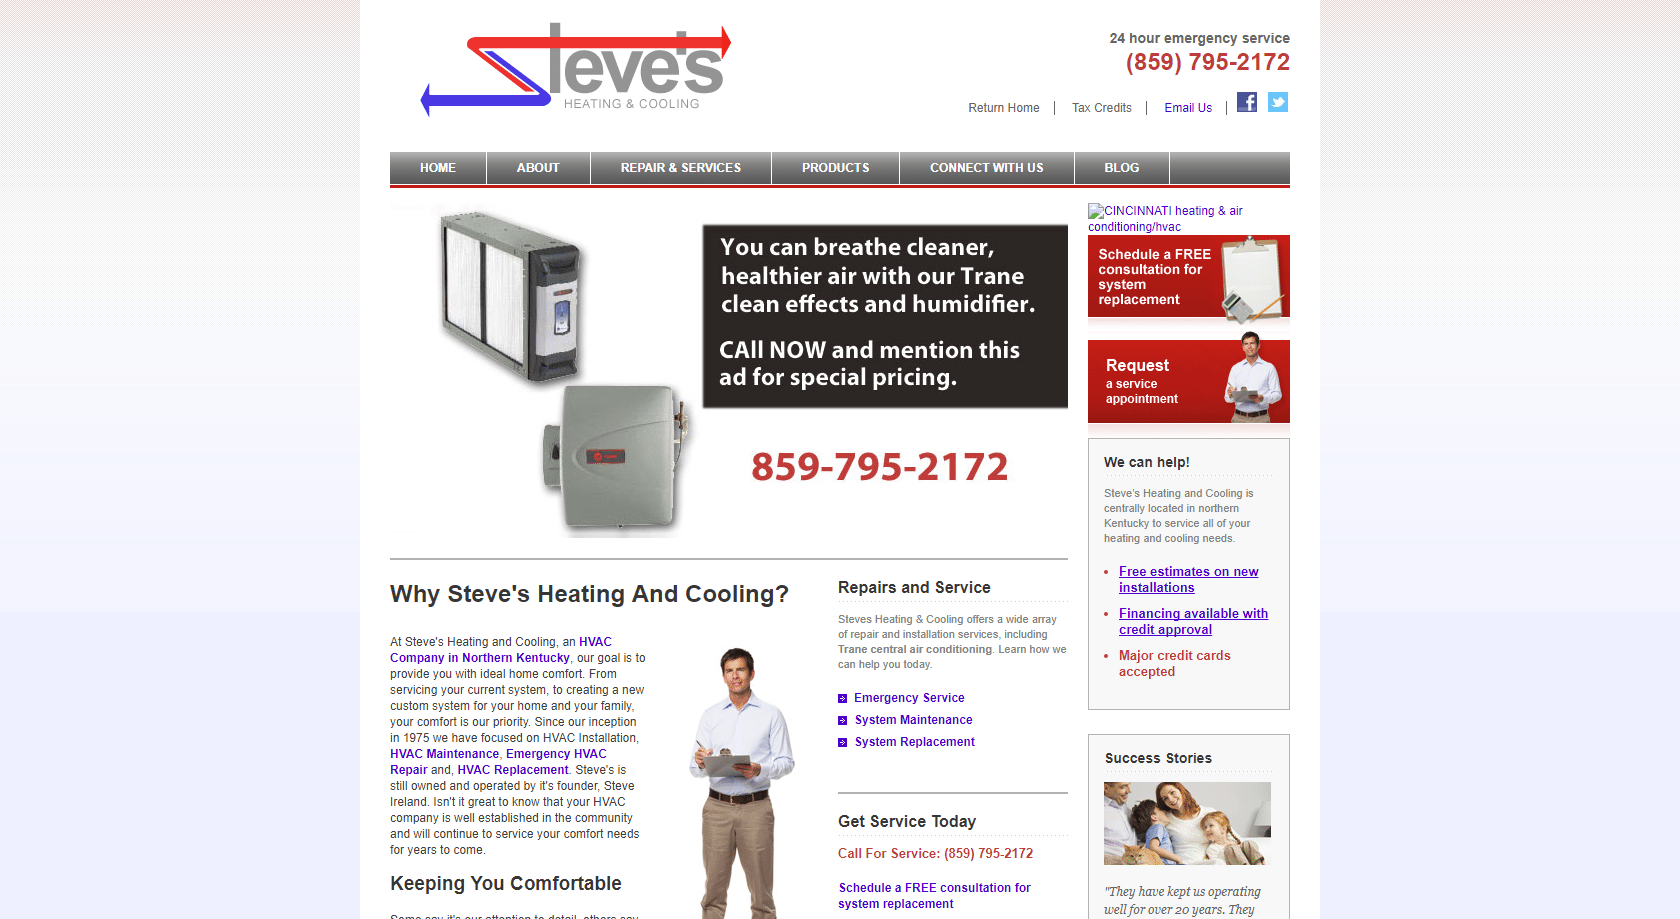 Steve's Heating old website